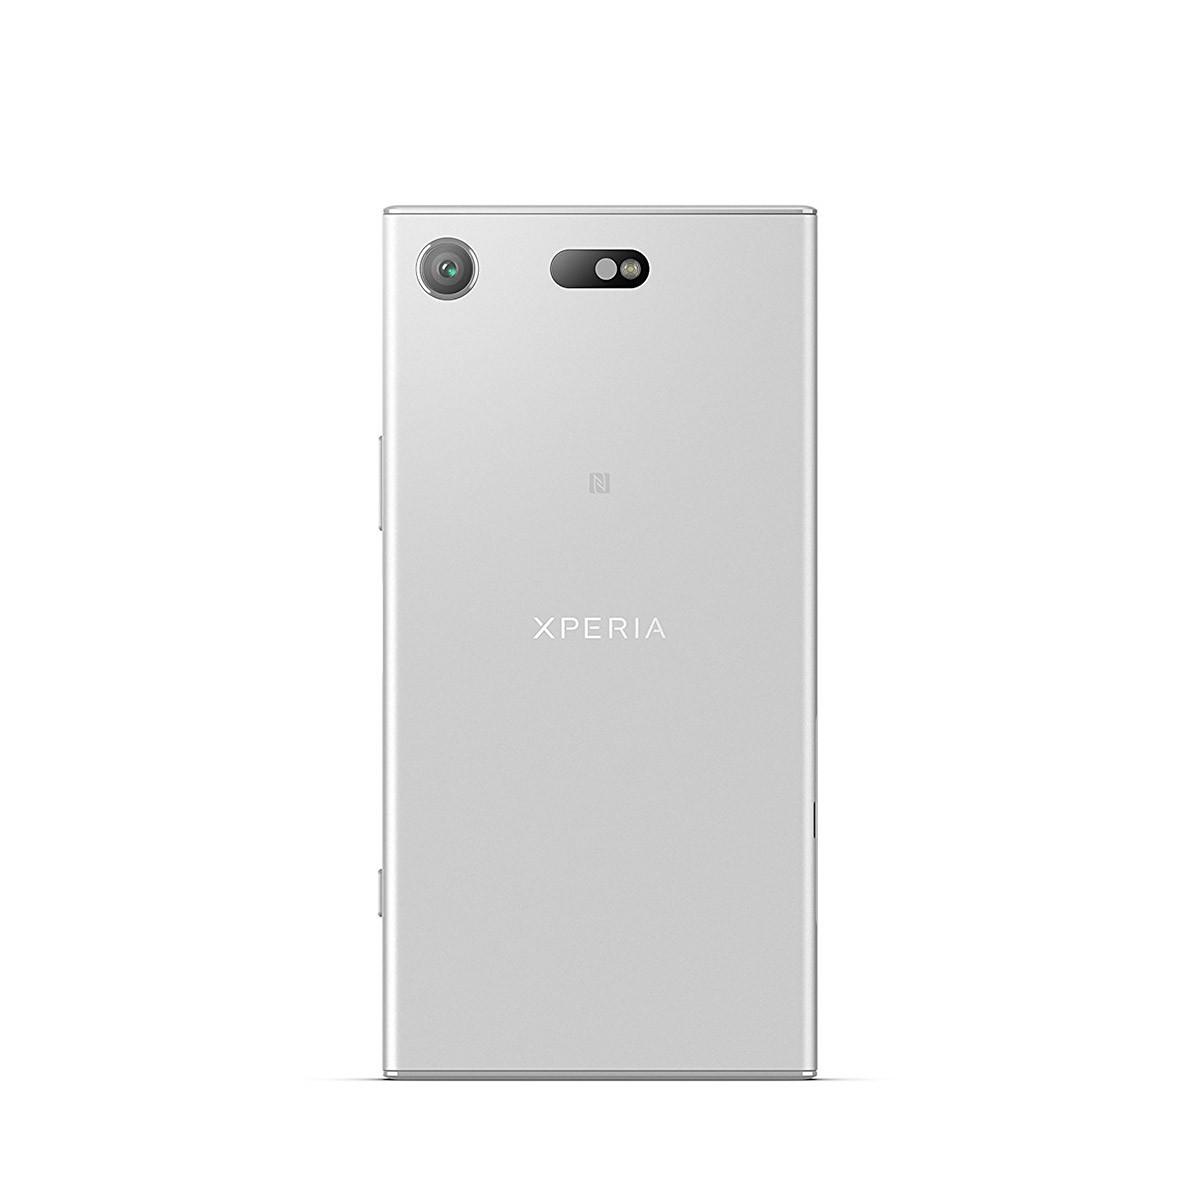 Xperia XZ2 Compact - Factory Unlocked Phone - 4.6